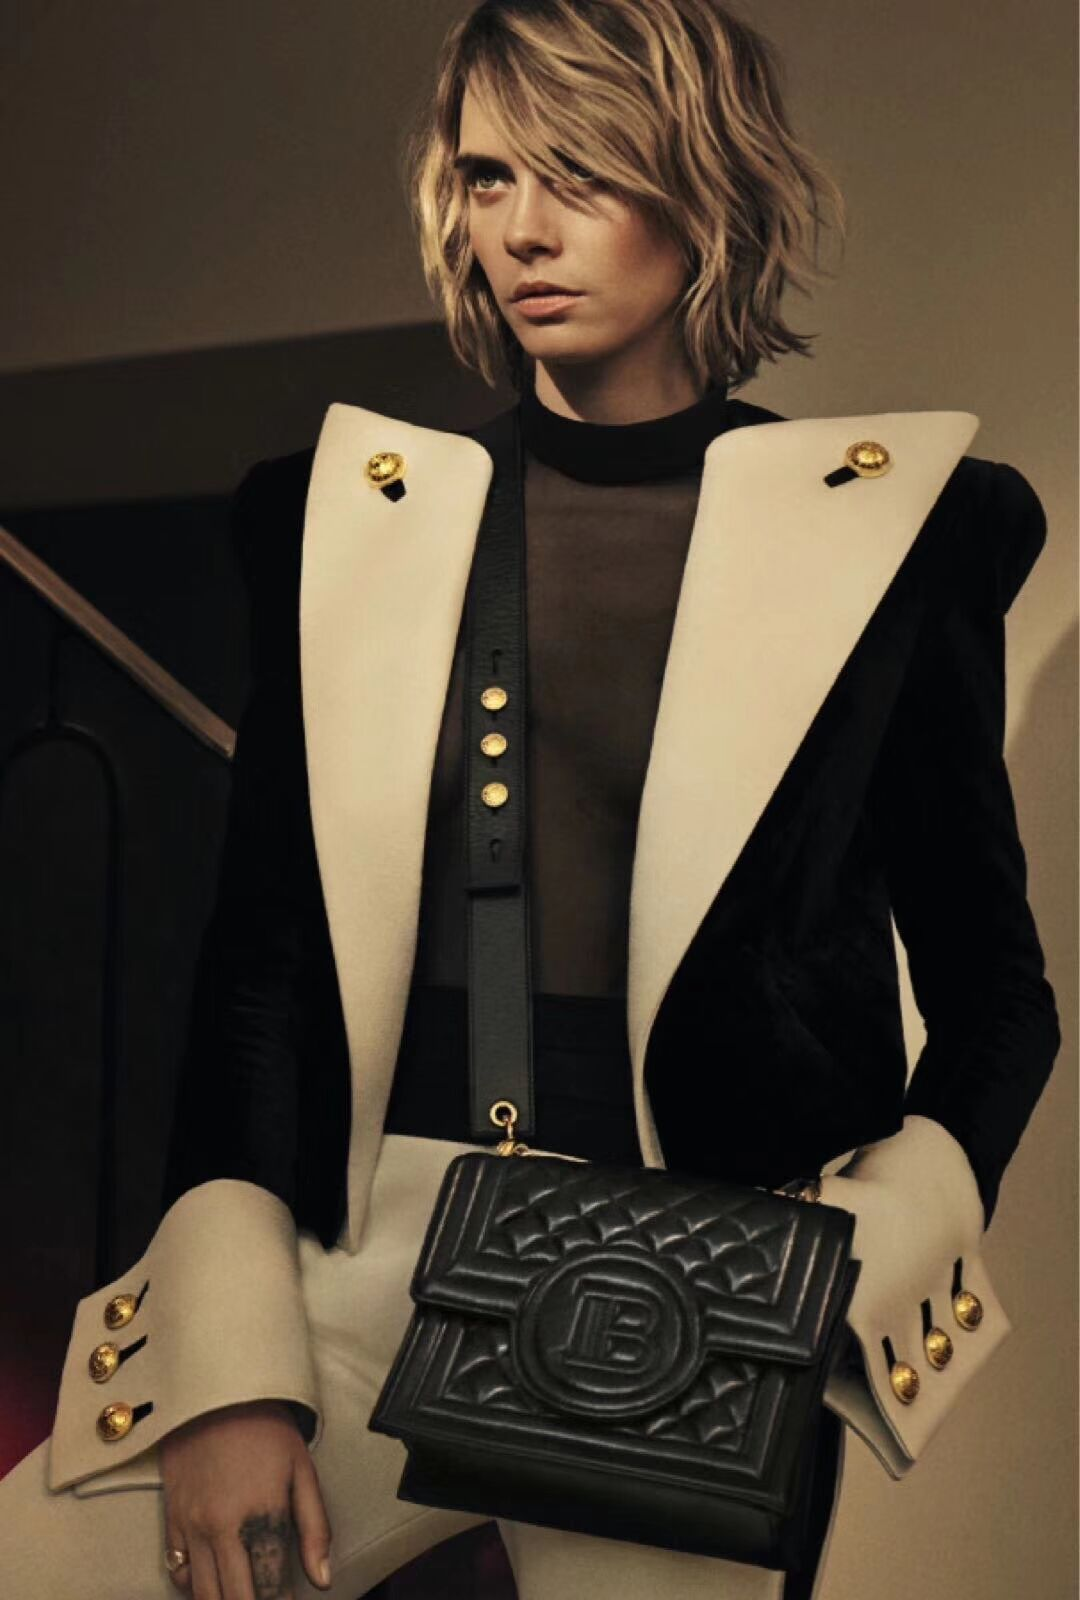 Ladies Blazer Fashionable Retro Gold Button Decoration Black White Short Suit Jacket Woman Slim Street Blazer Feminino Manteau